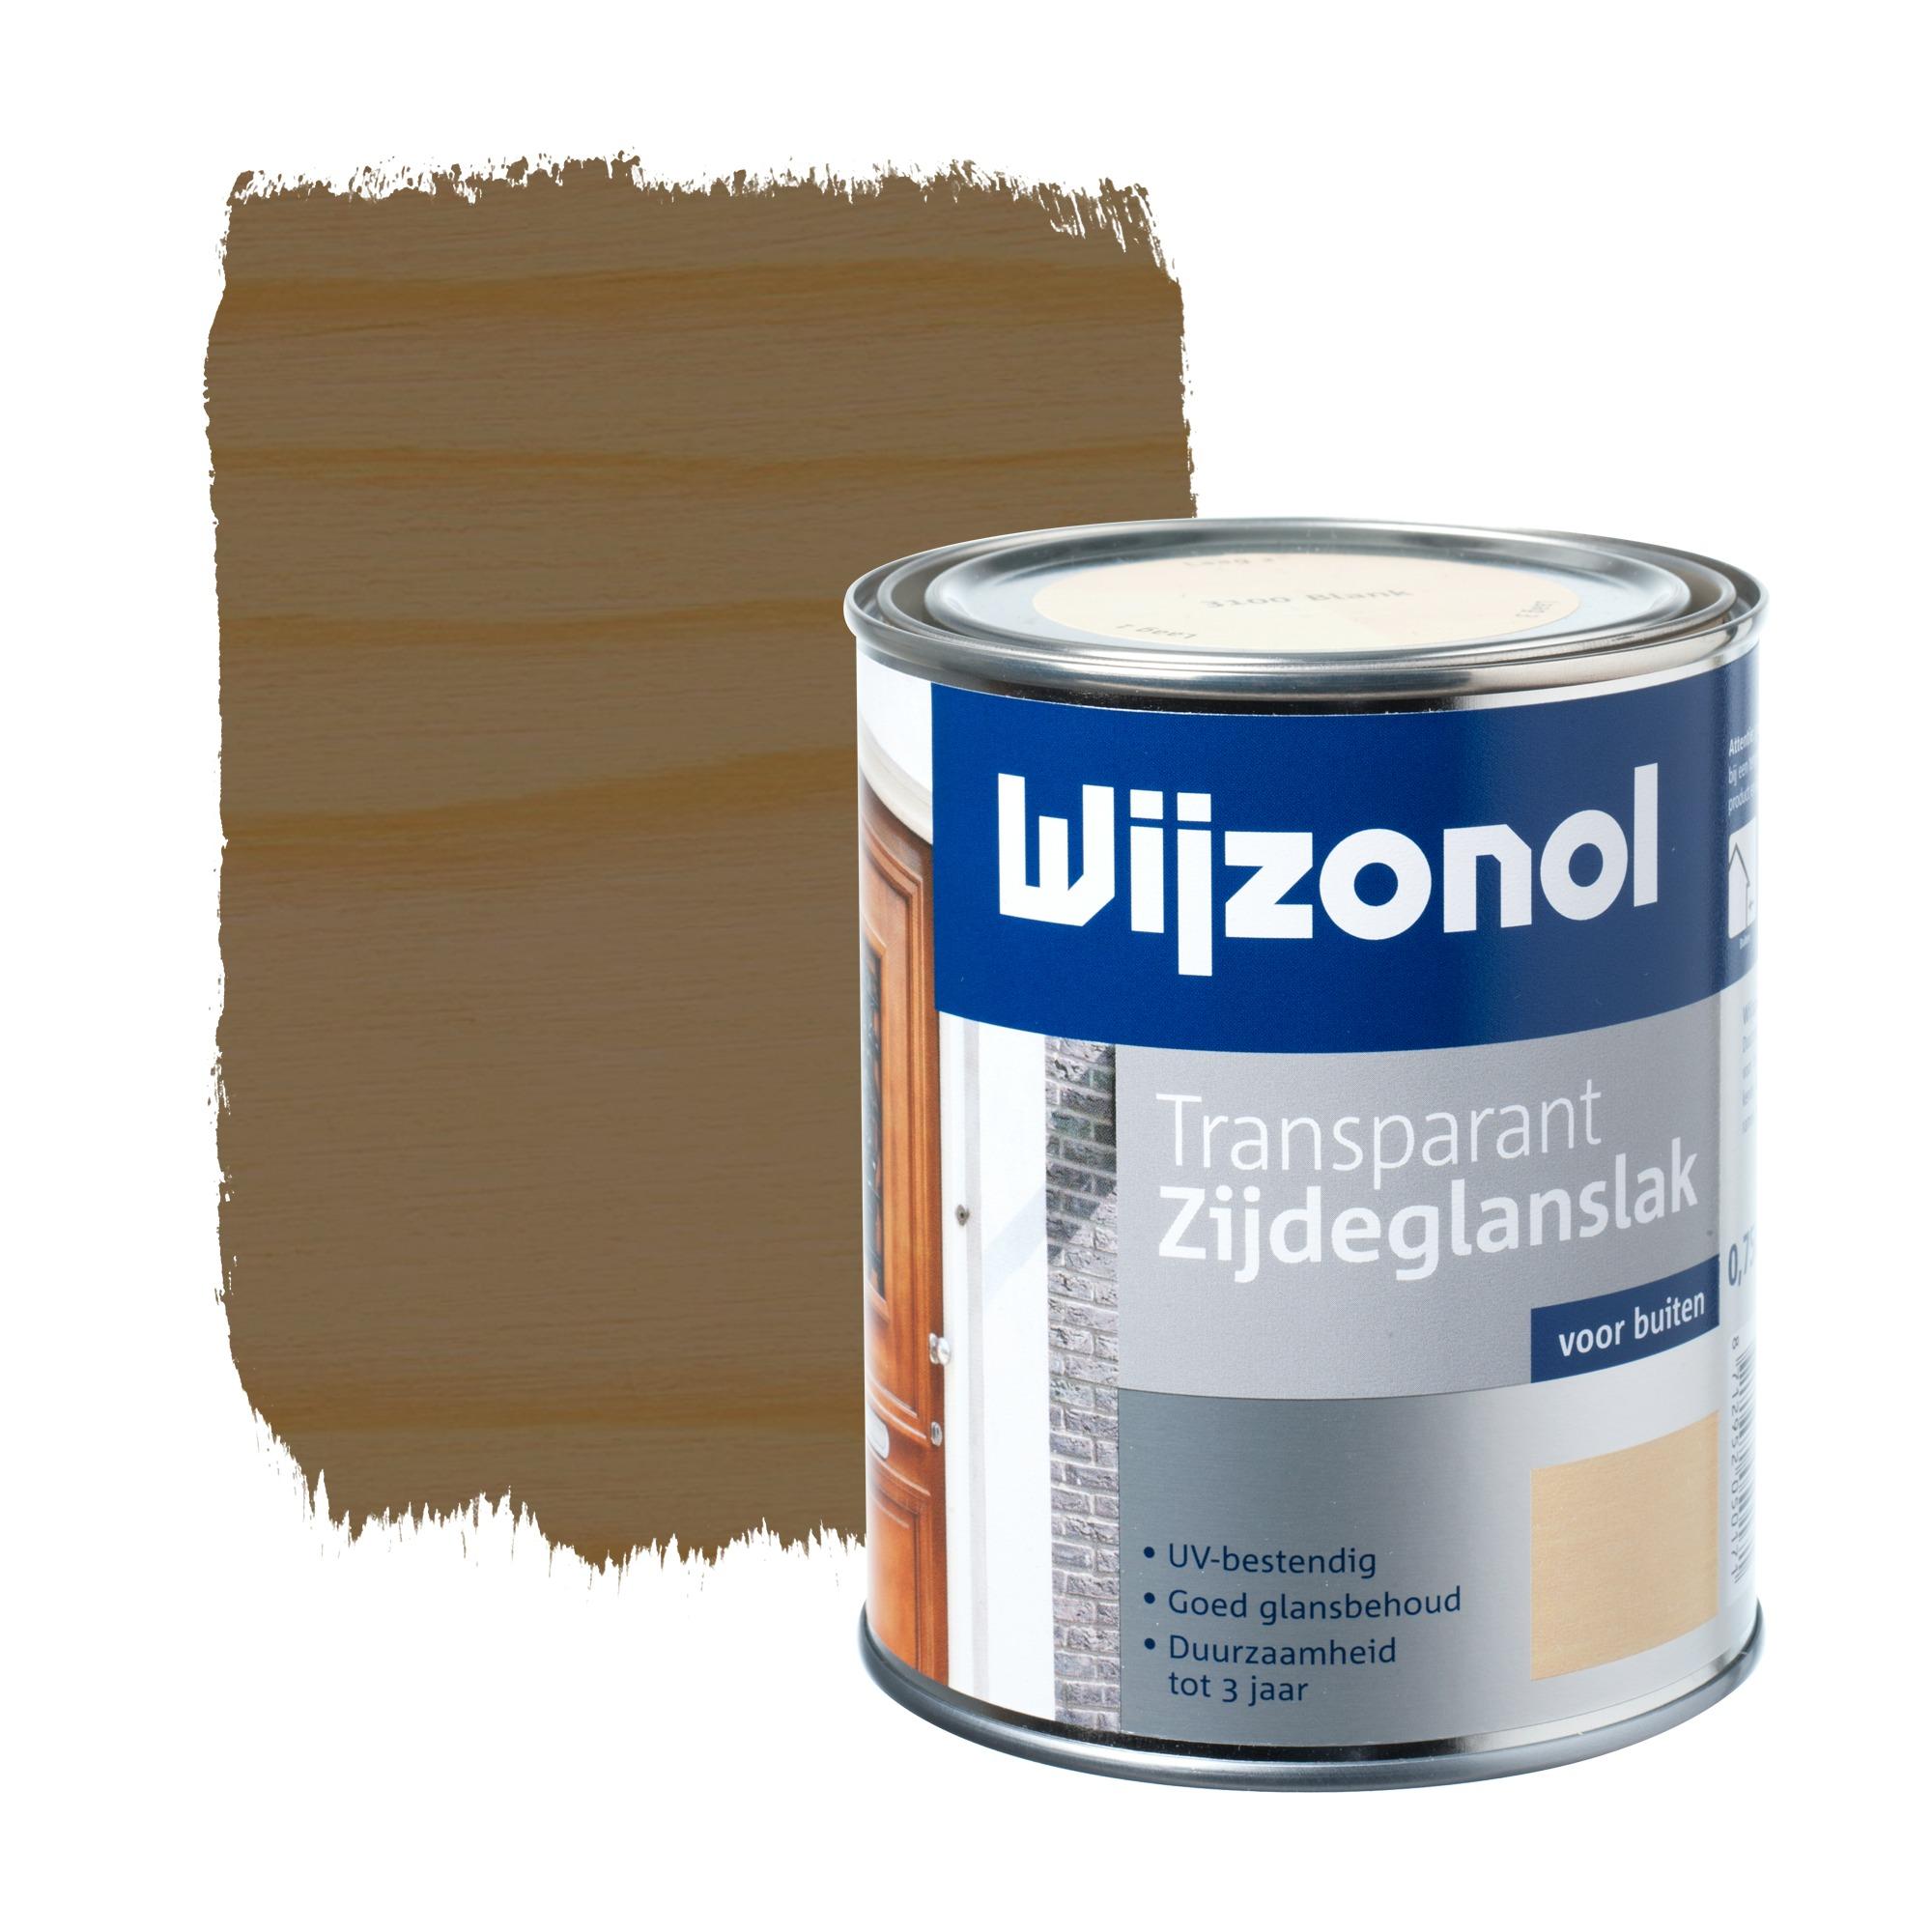 Wijzonol rm buitenverf zijdeglans transparant alkyd teak 3120 750 ml